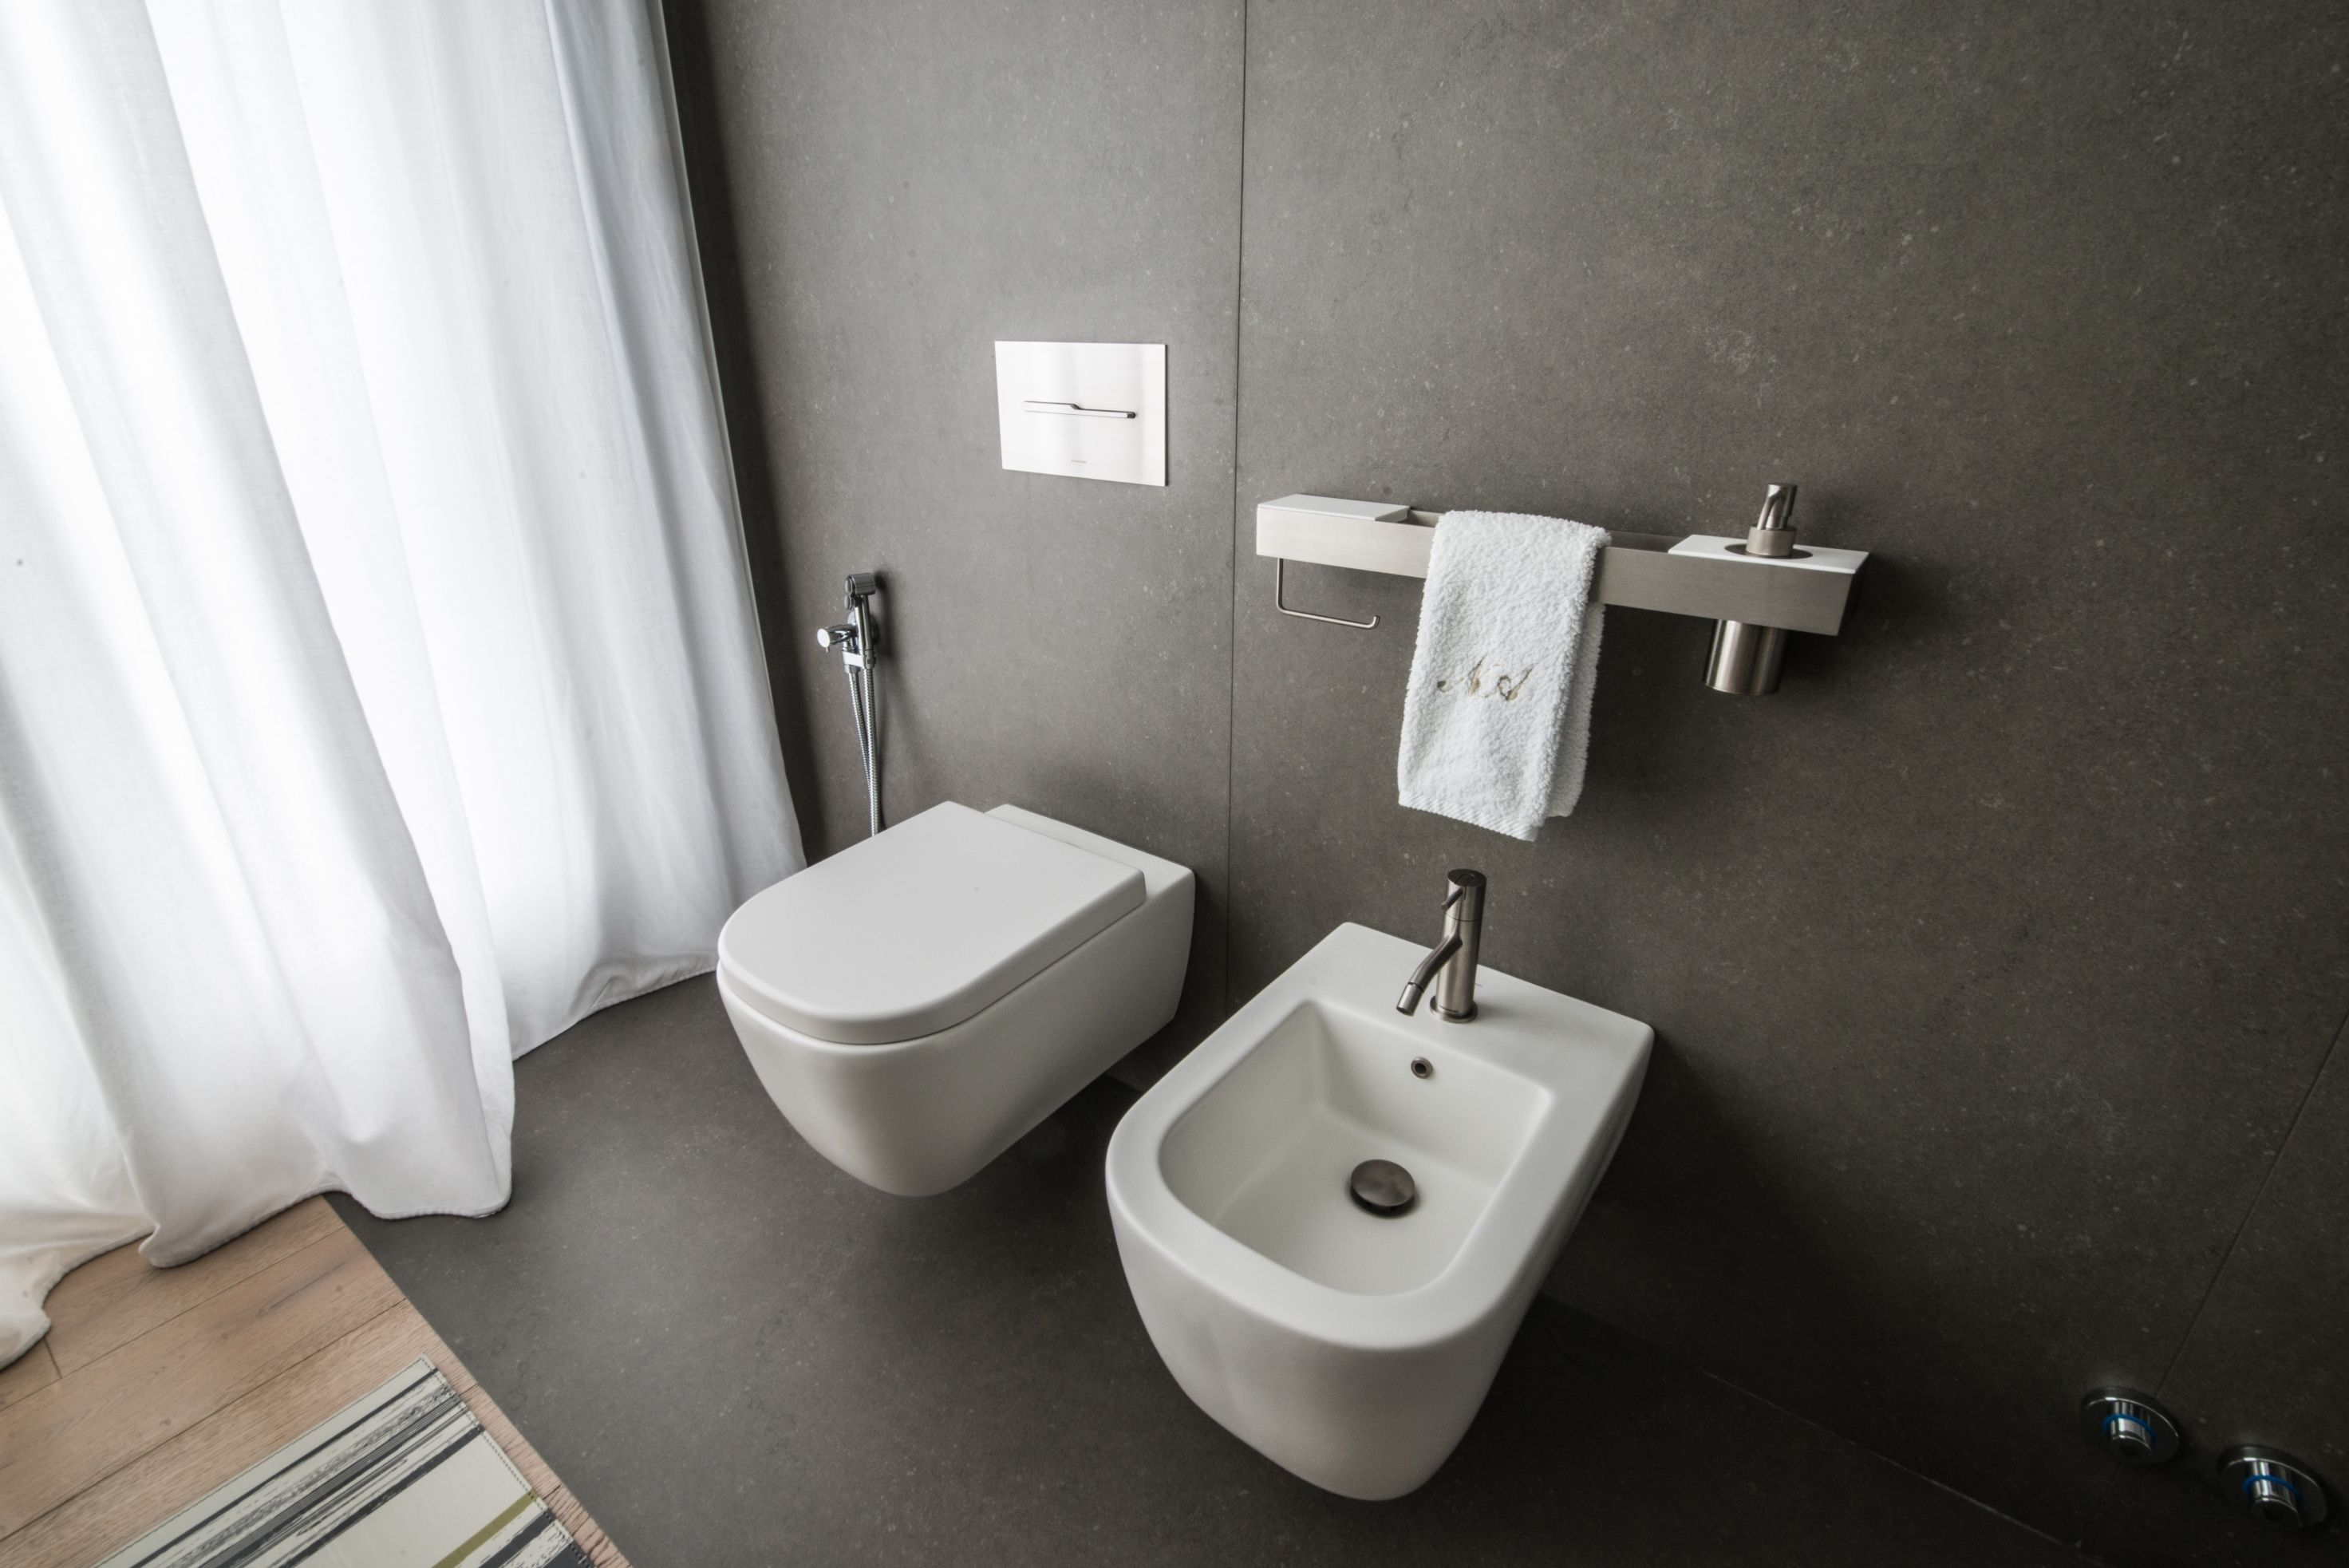 Arredamento mobili bagno sanitari marmo arredo bagno